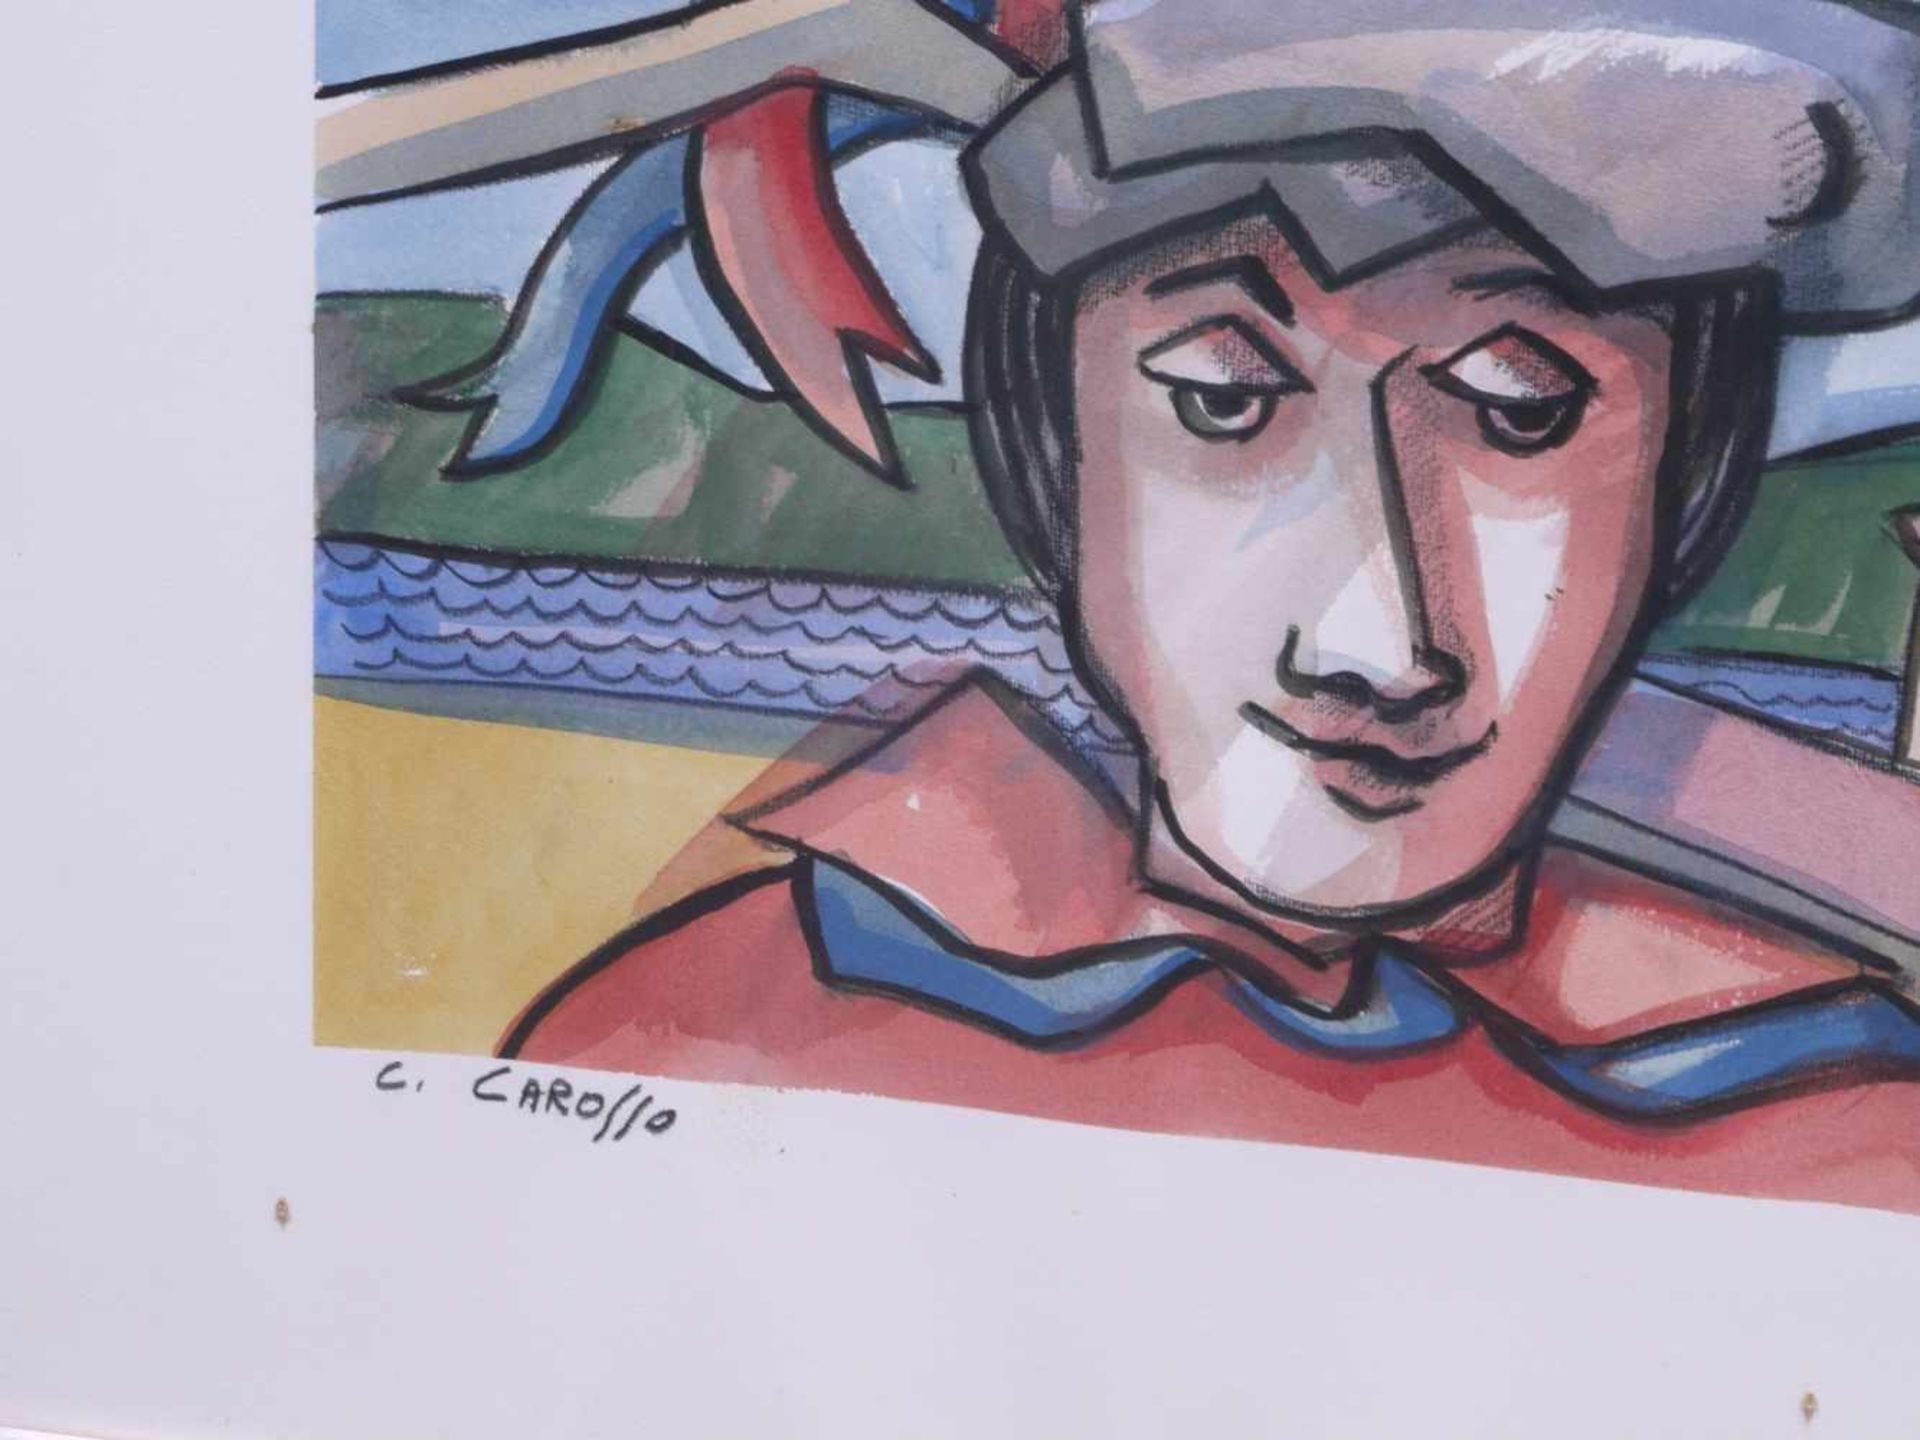 Carosso, Carlo (1953-2007) - IkonographieGroßformatiges Aquarell, horizontal in drei Bildfelder - Bild 4 aus 4